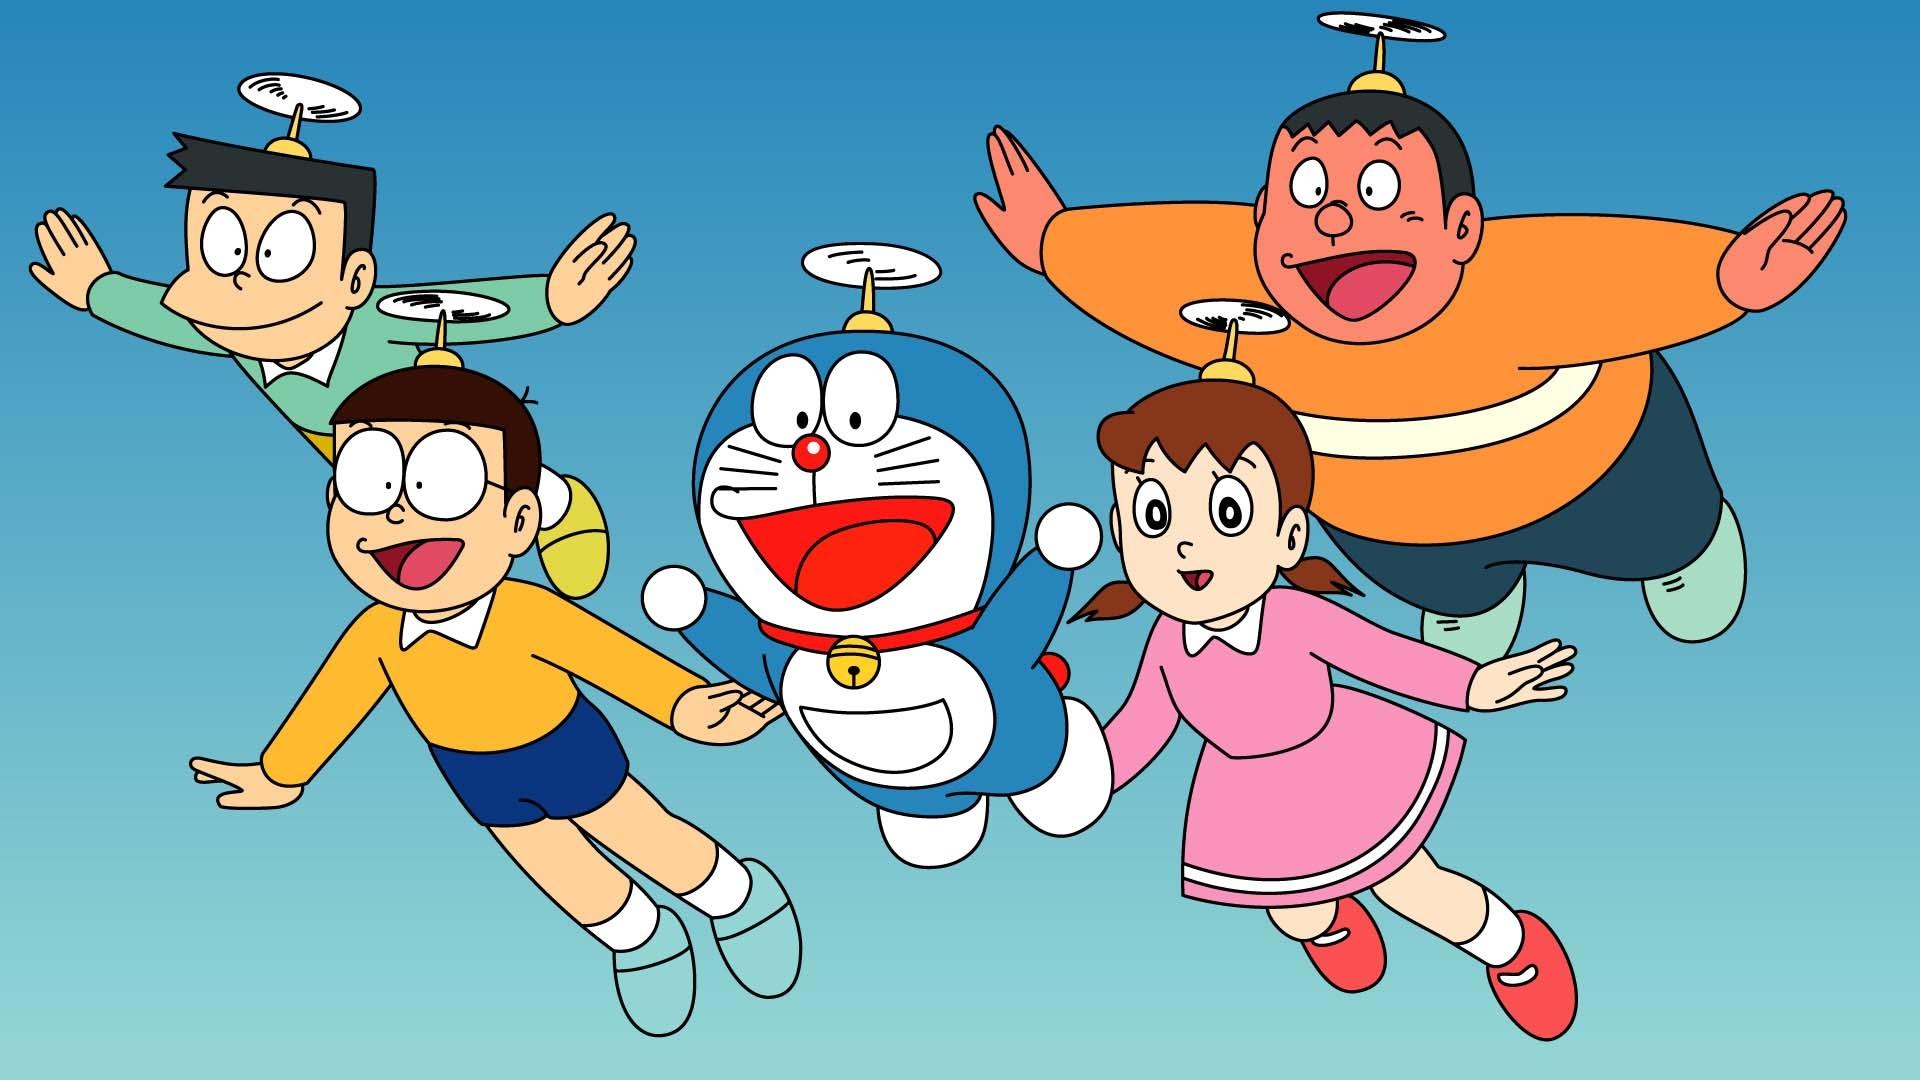 Doraemon Hd Wallpaper Background Image 1920x1080 Id671758